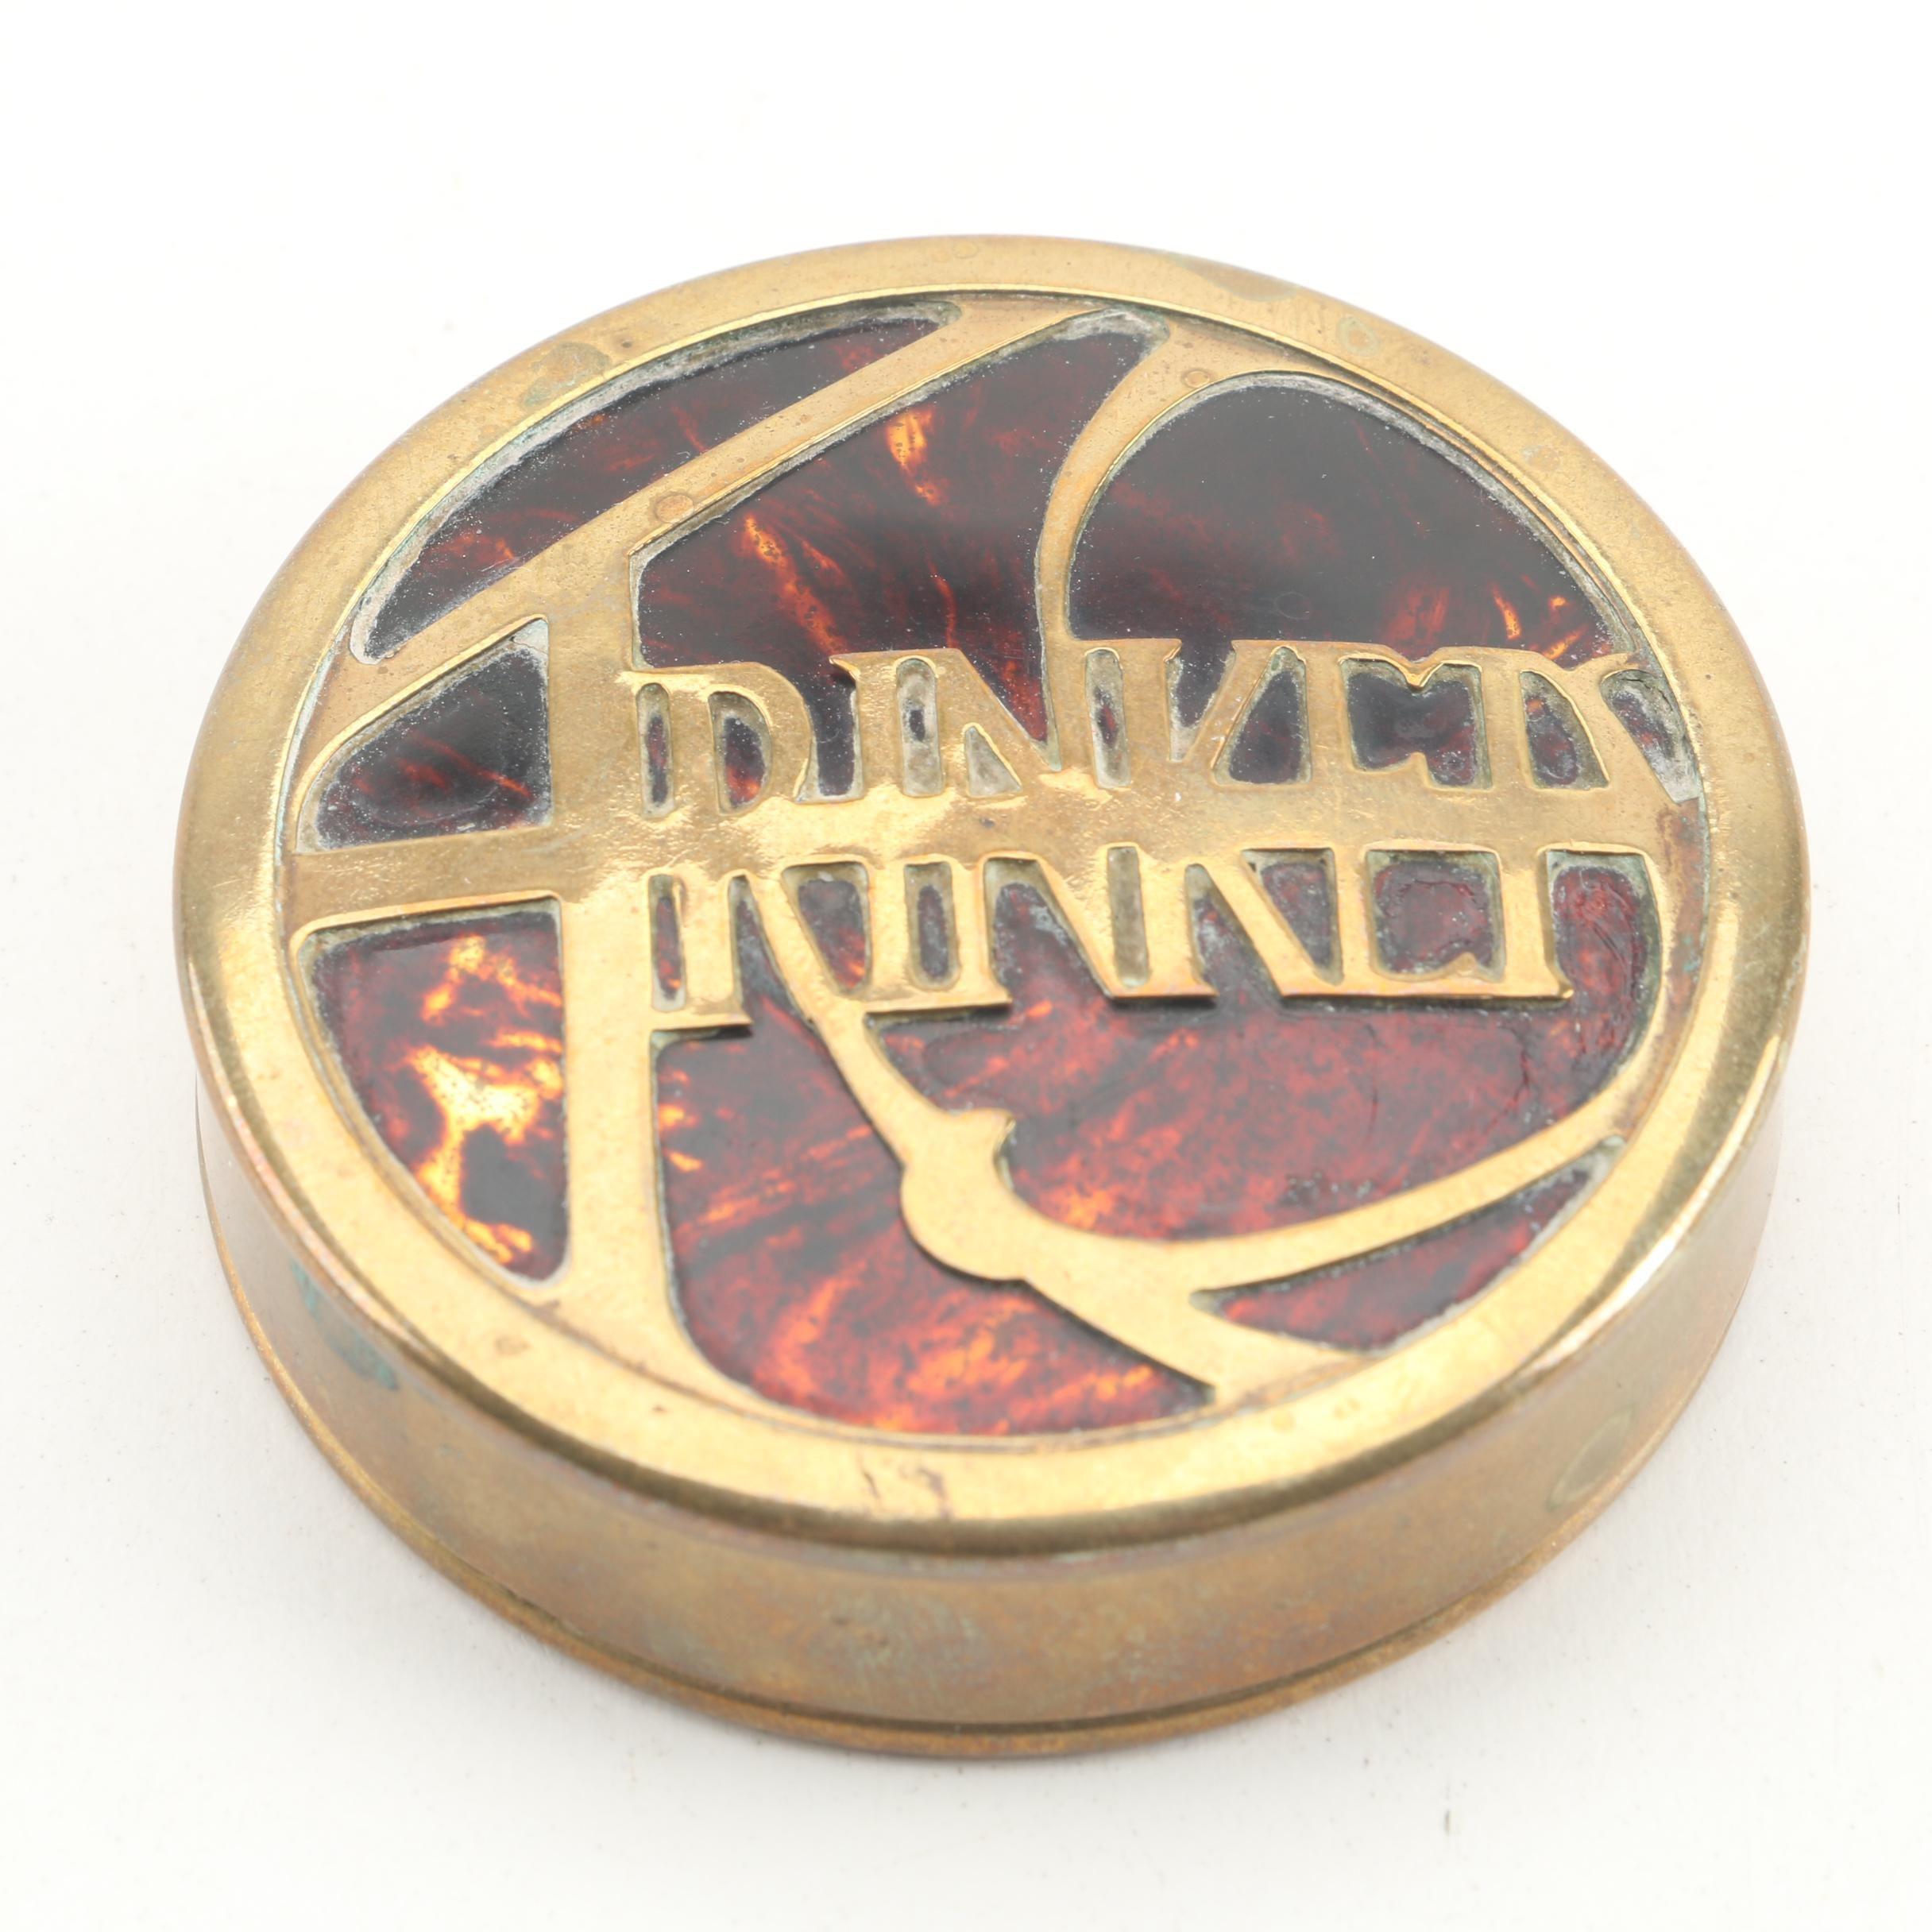 Antique Brass Trinket Box With Imitation Tortoise Shell and Enamel